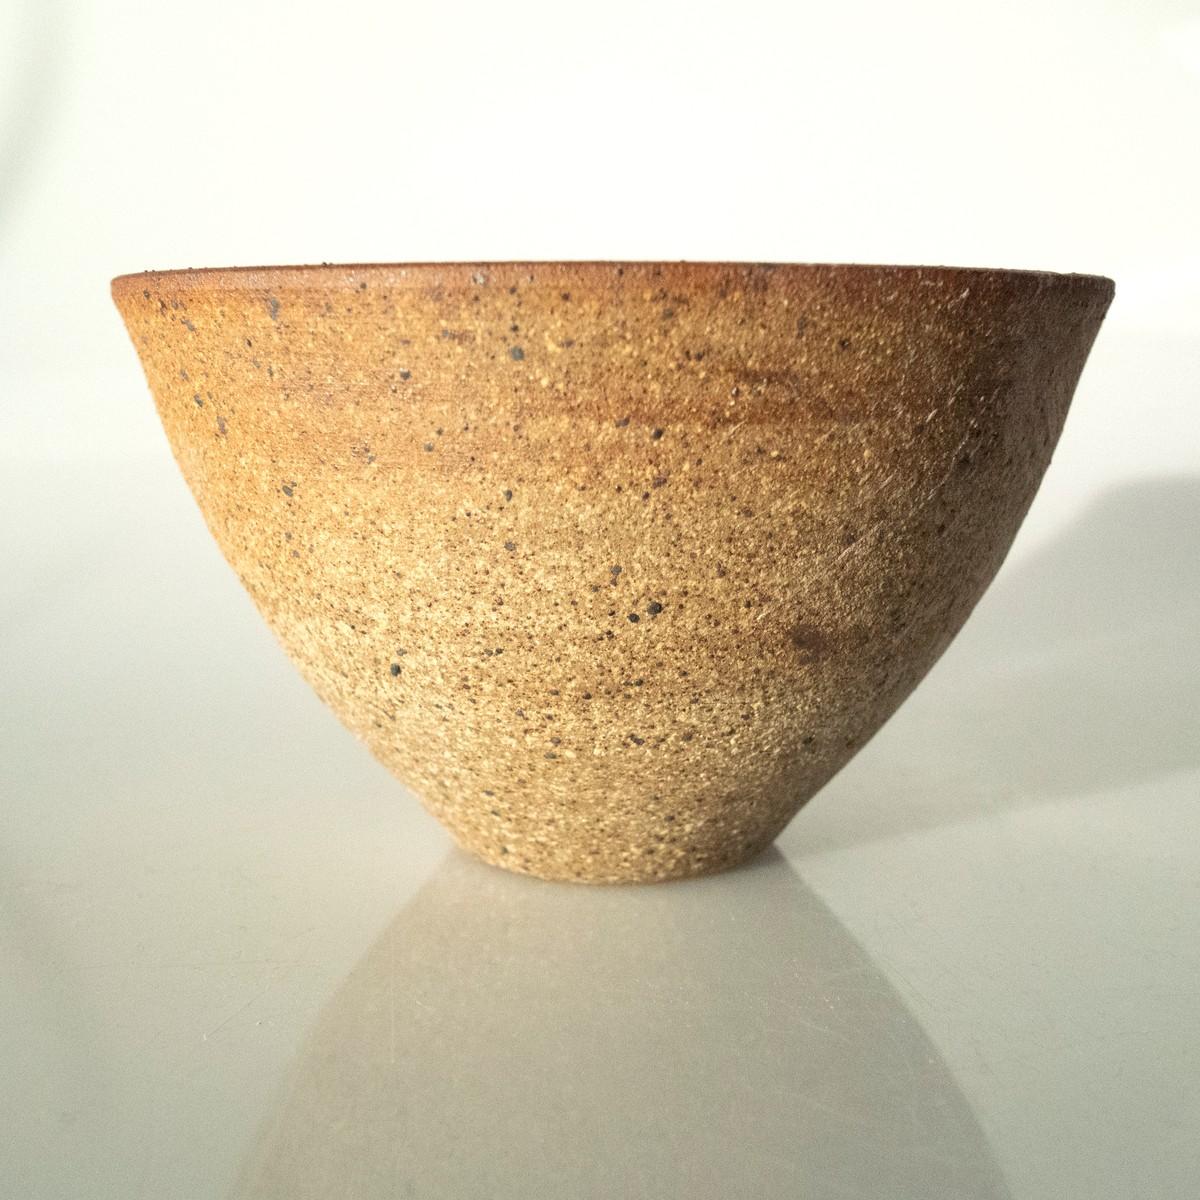 Photo of Elements Tea Bowl